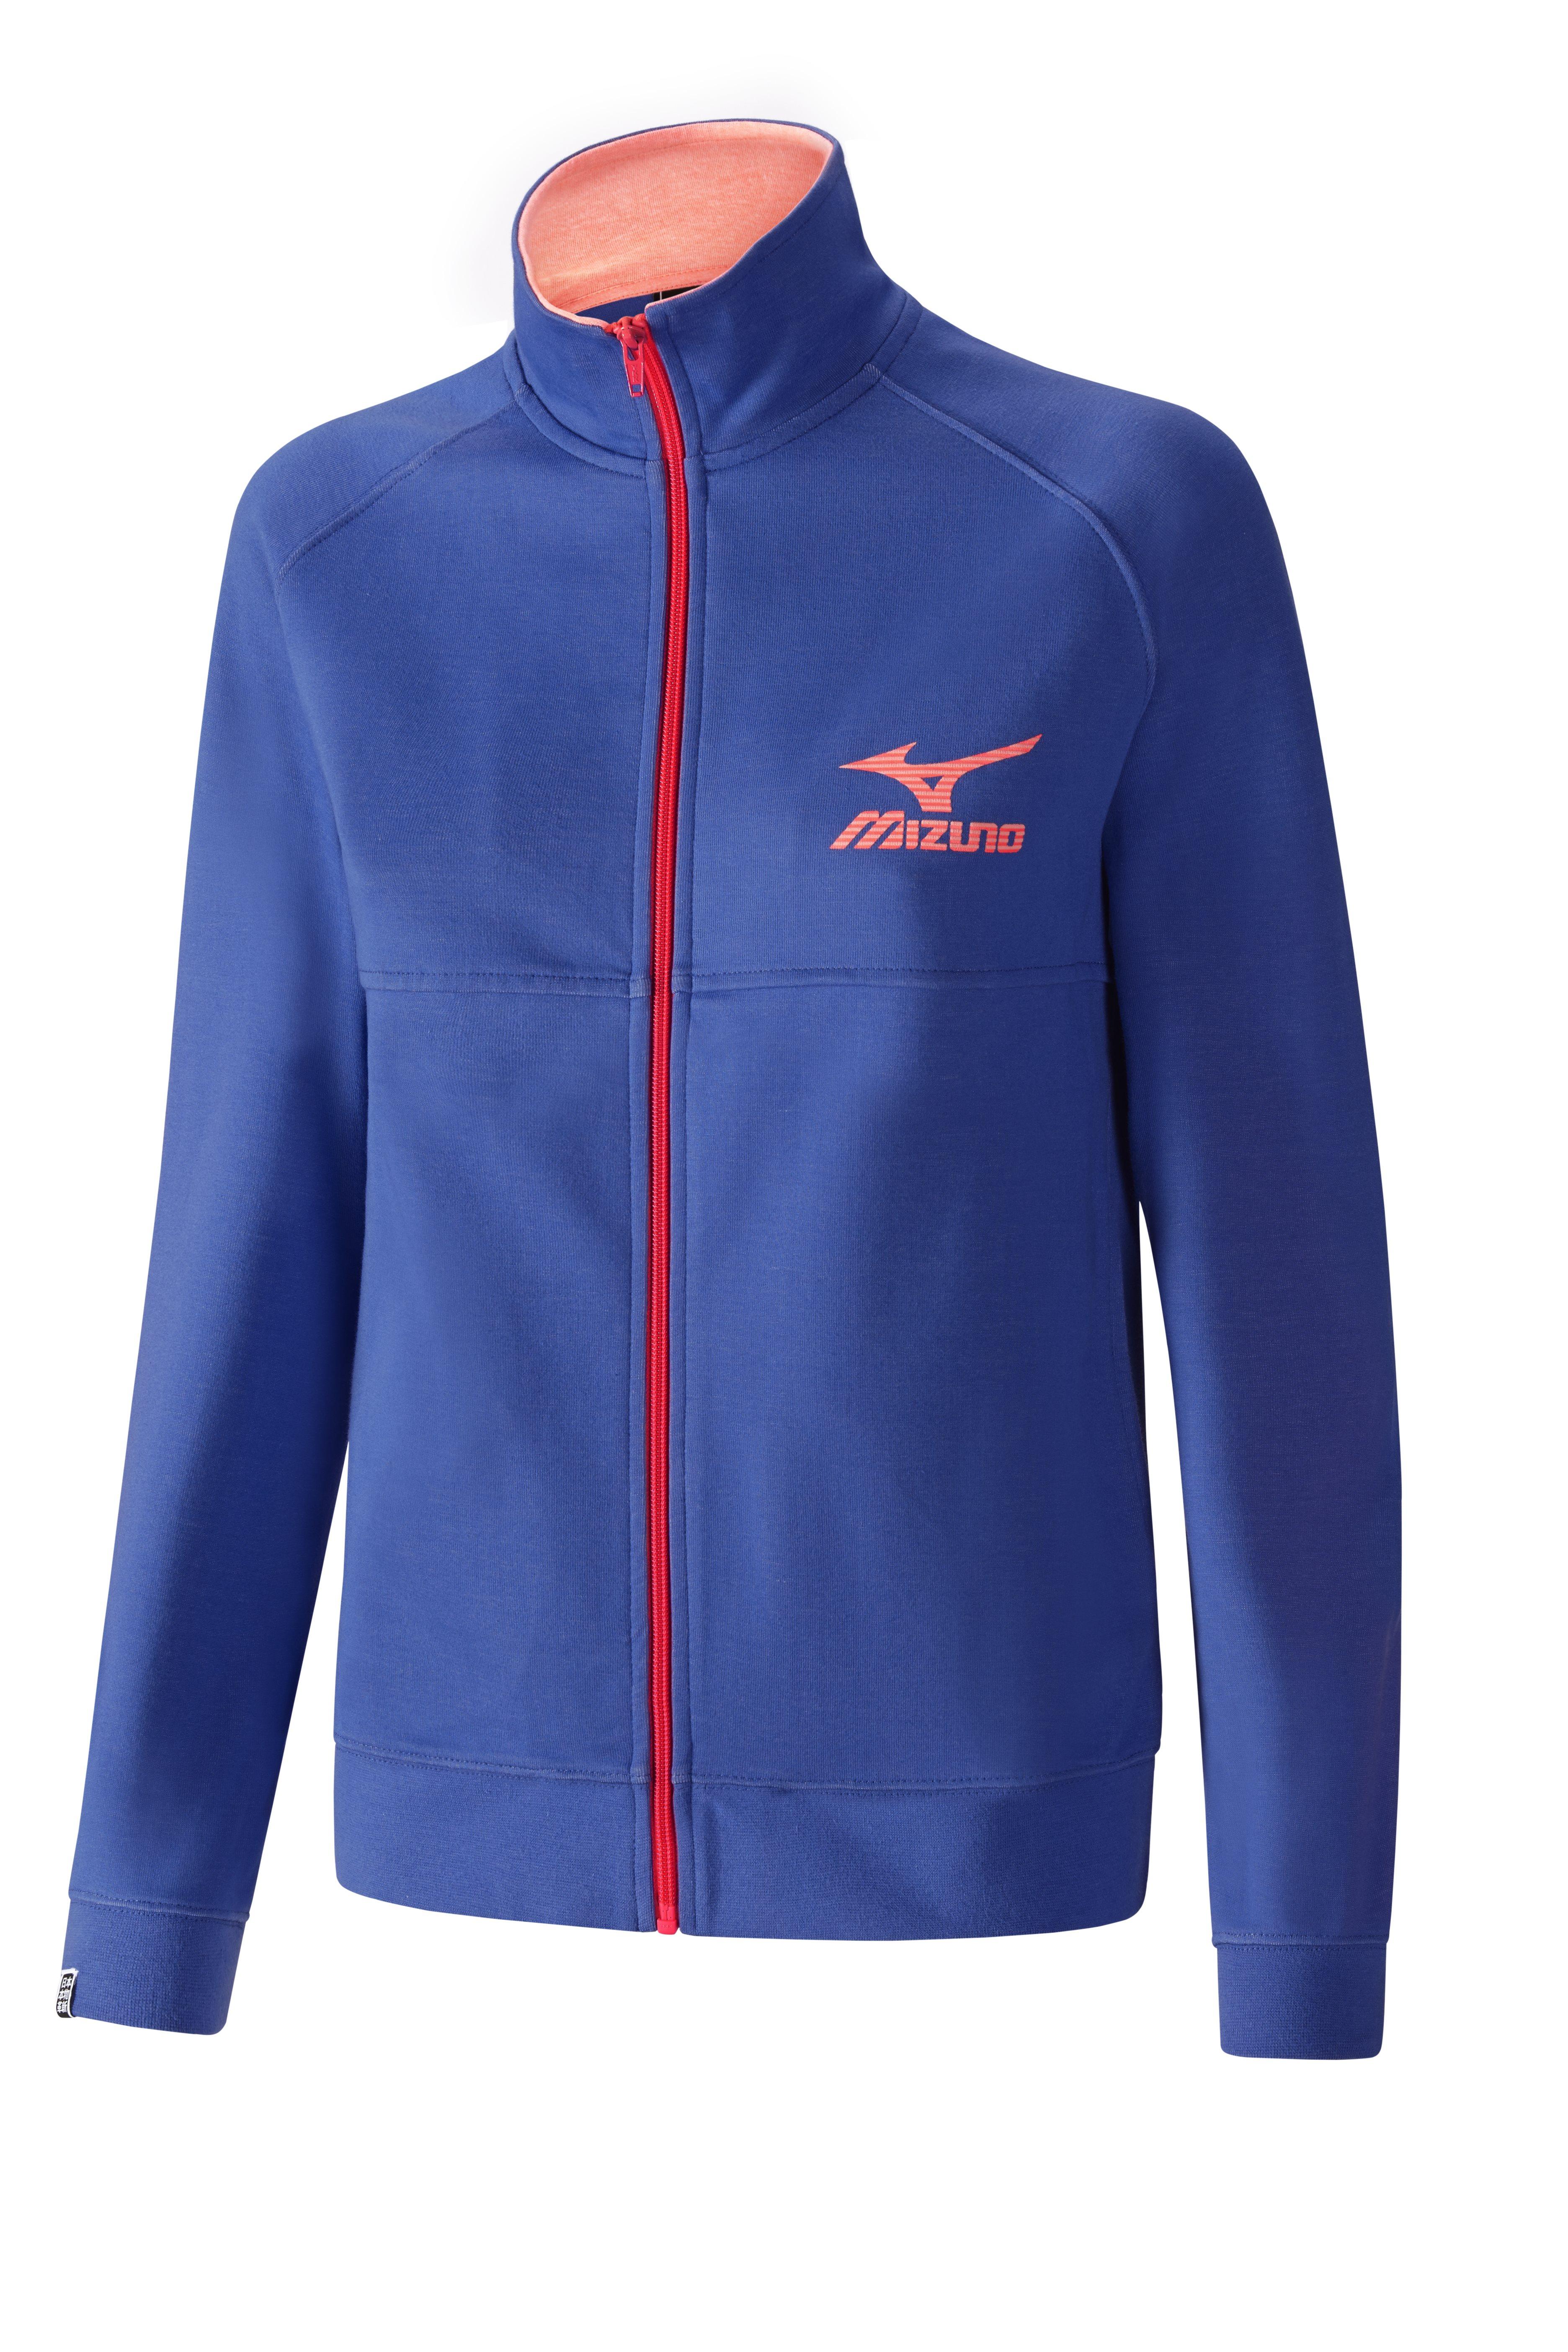 Mizuno Full Zip Jacket K2EC684427 L